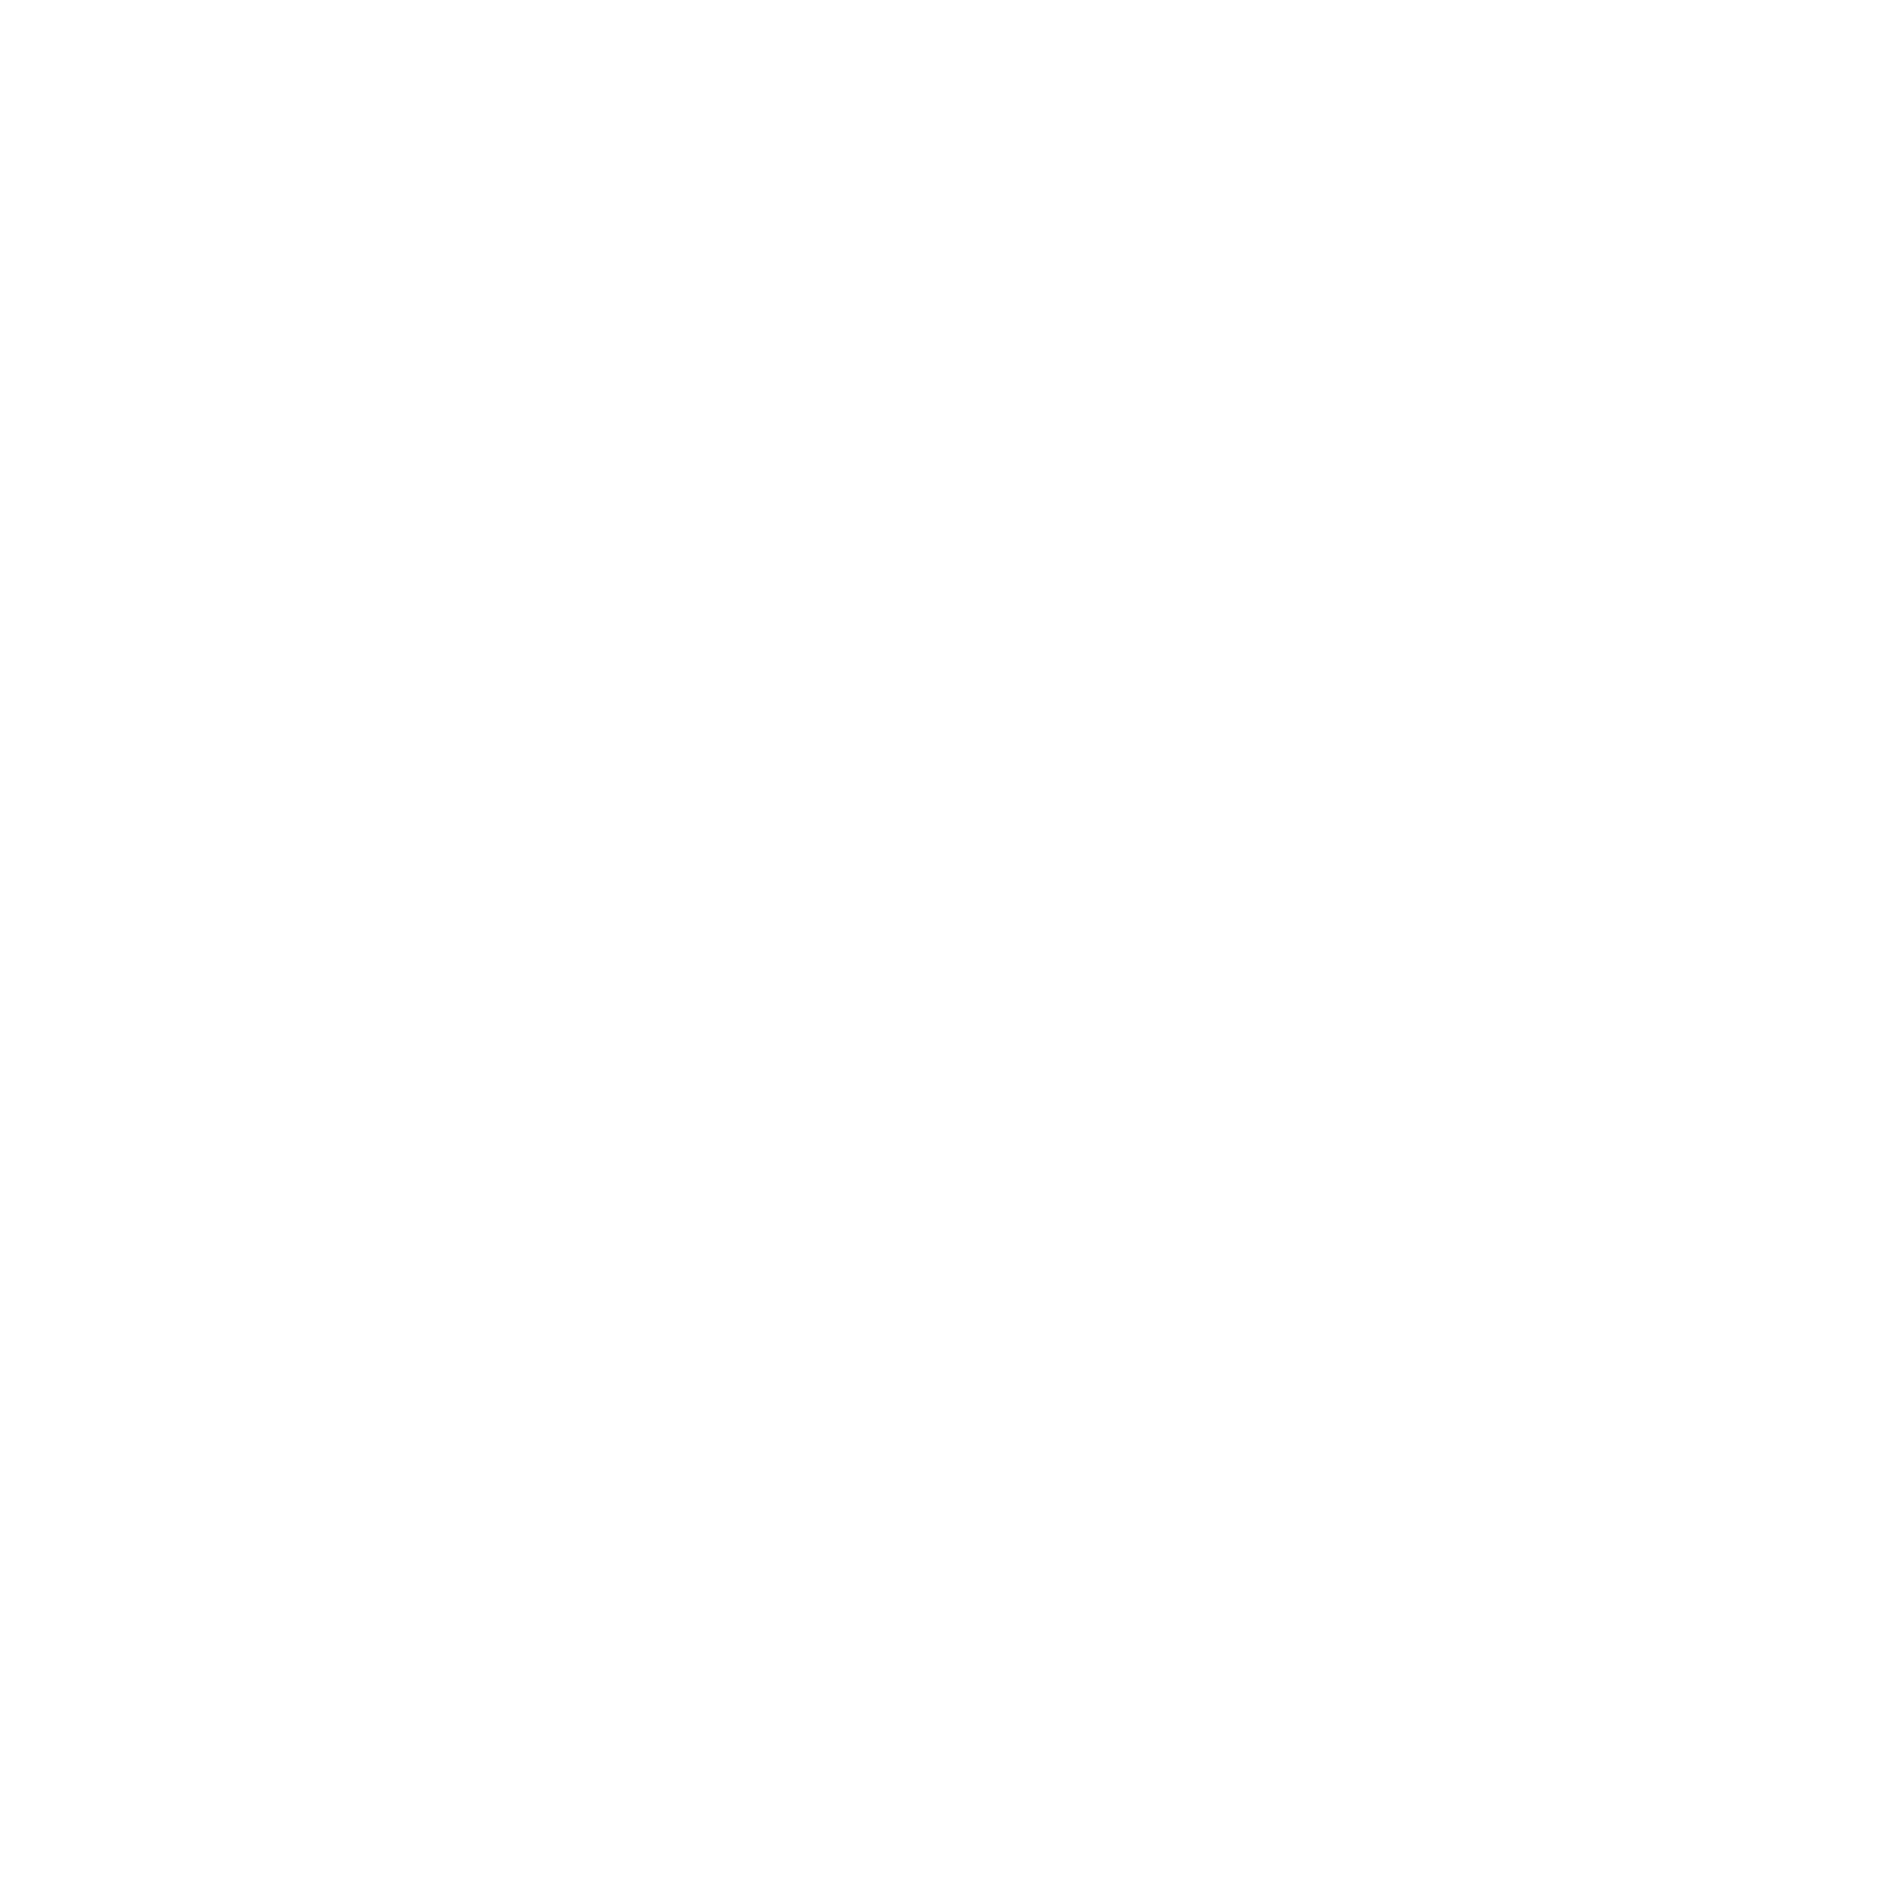 Microsalt